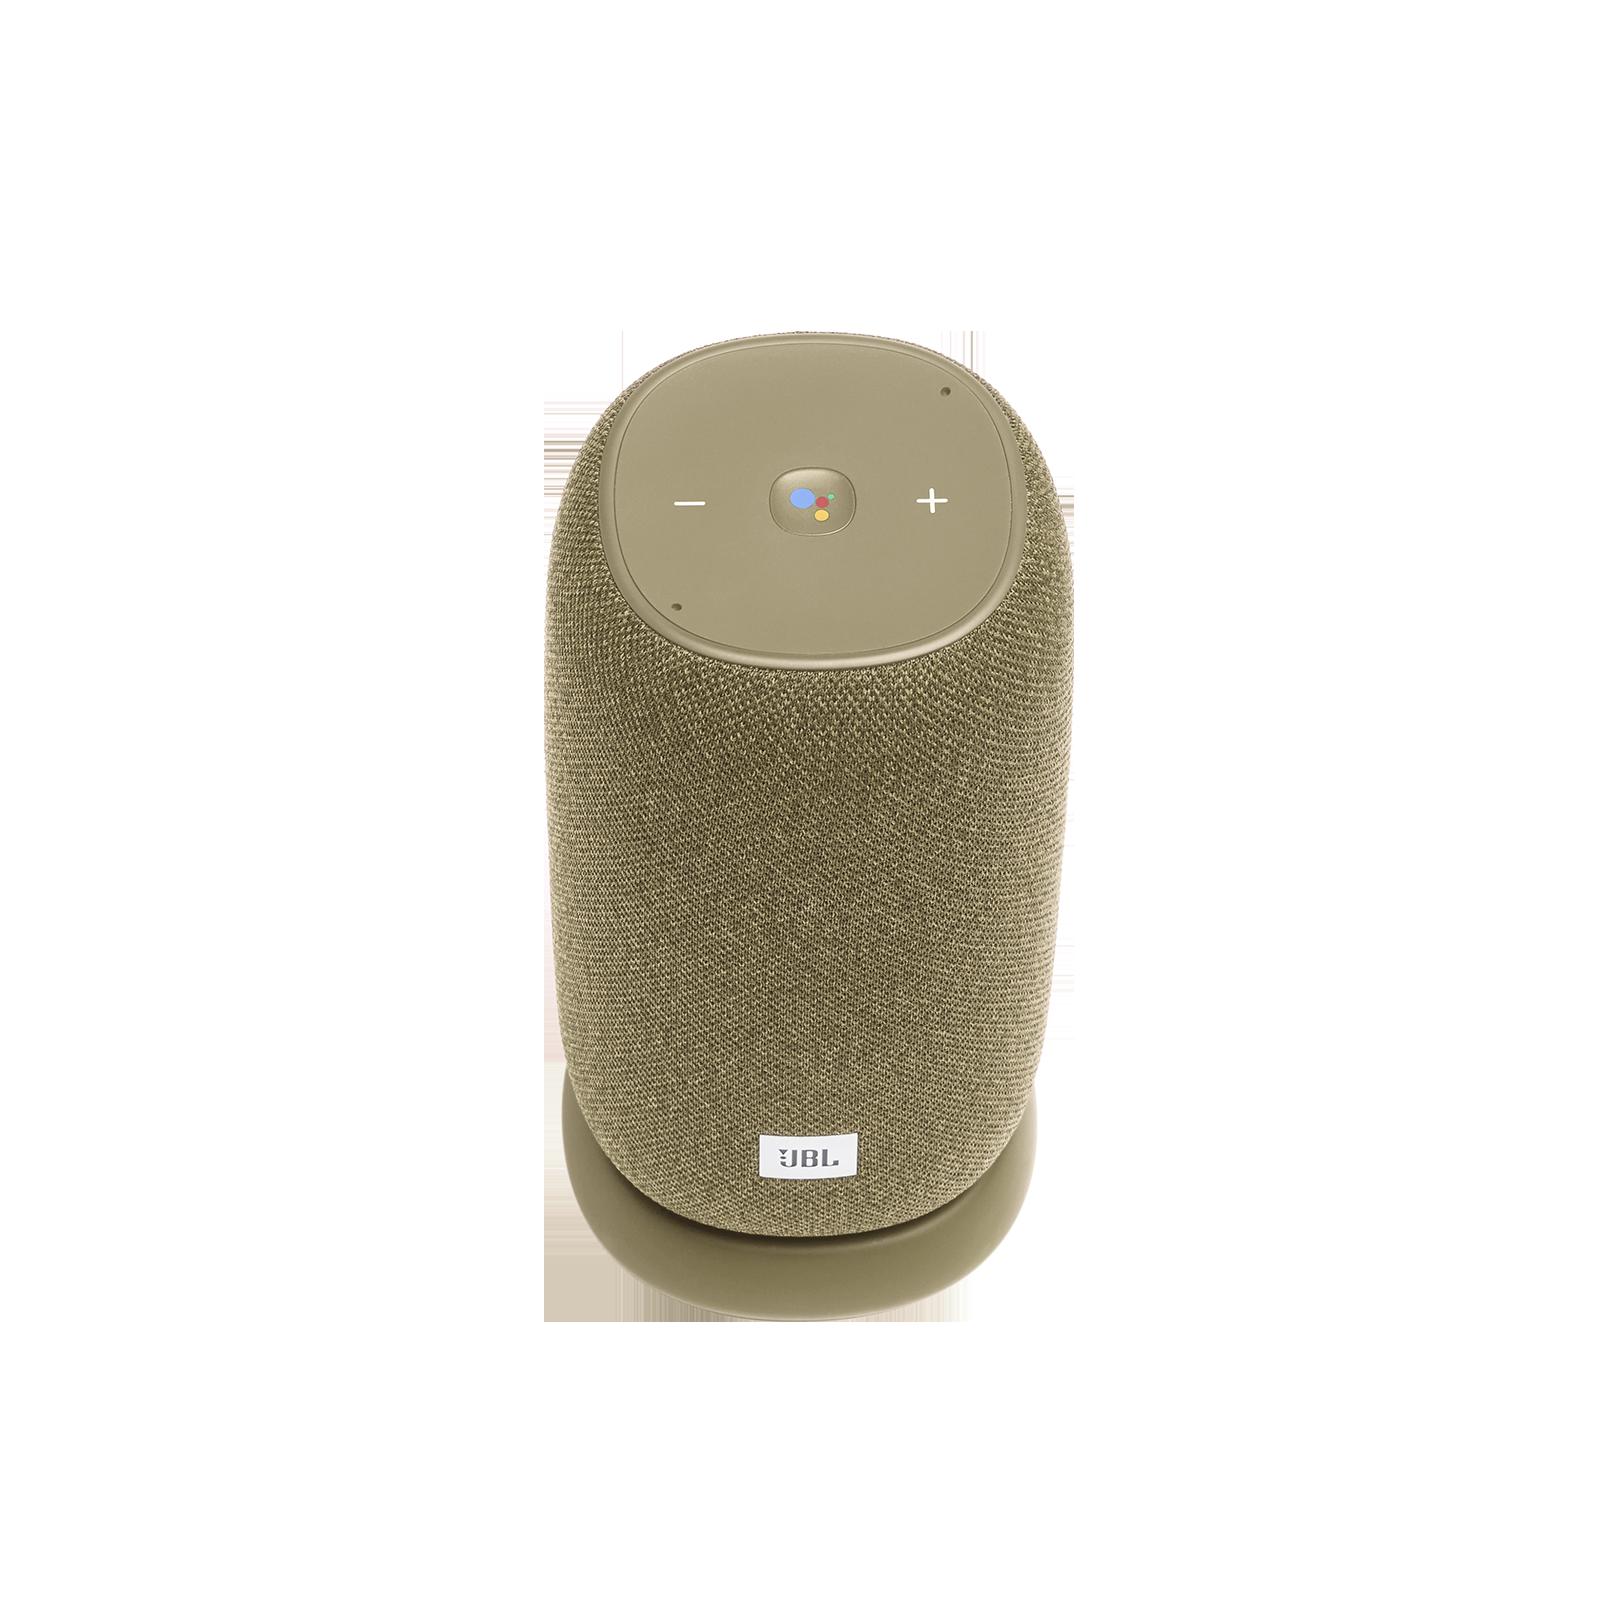 JBL Link Portable - Straw - Portable Wi-Fi Speaker - Front